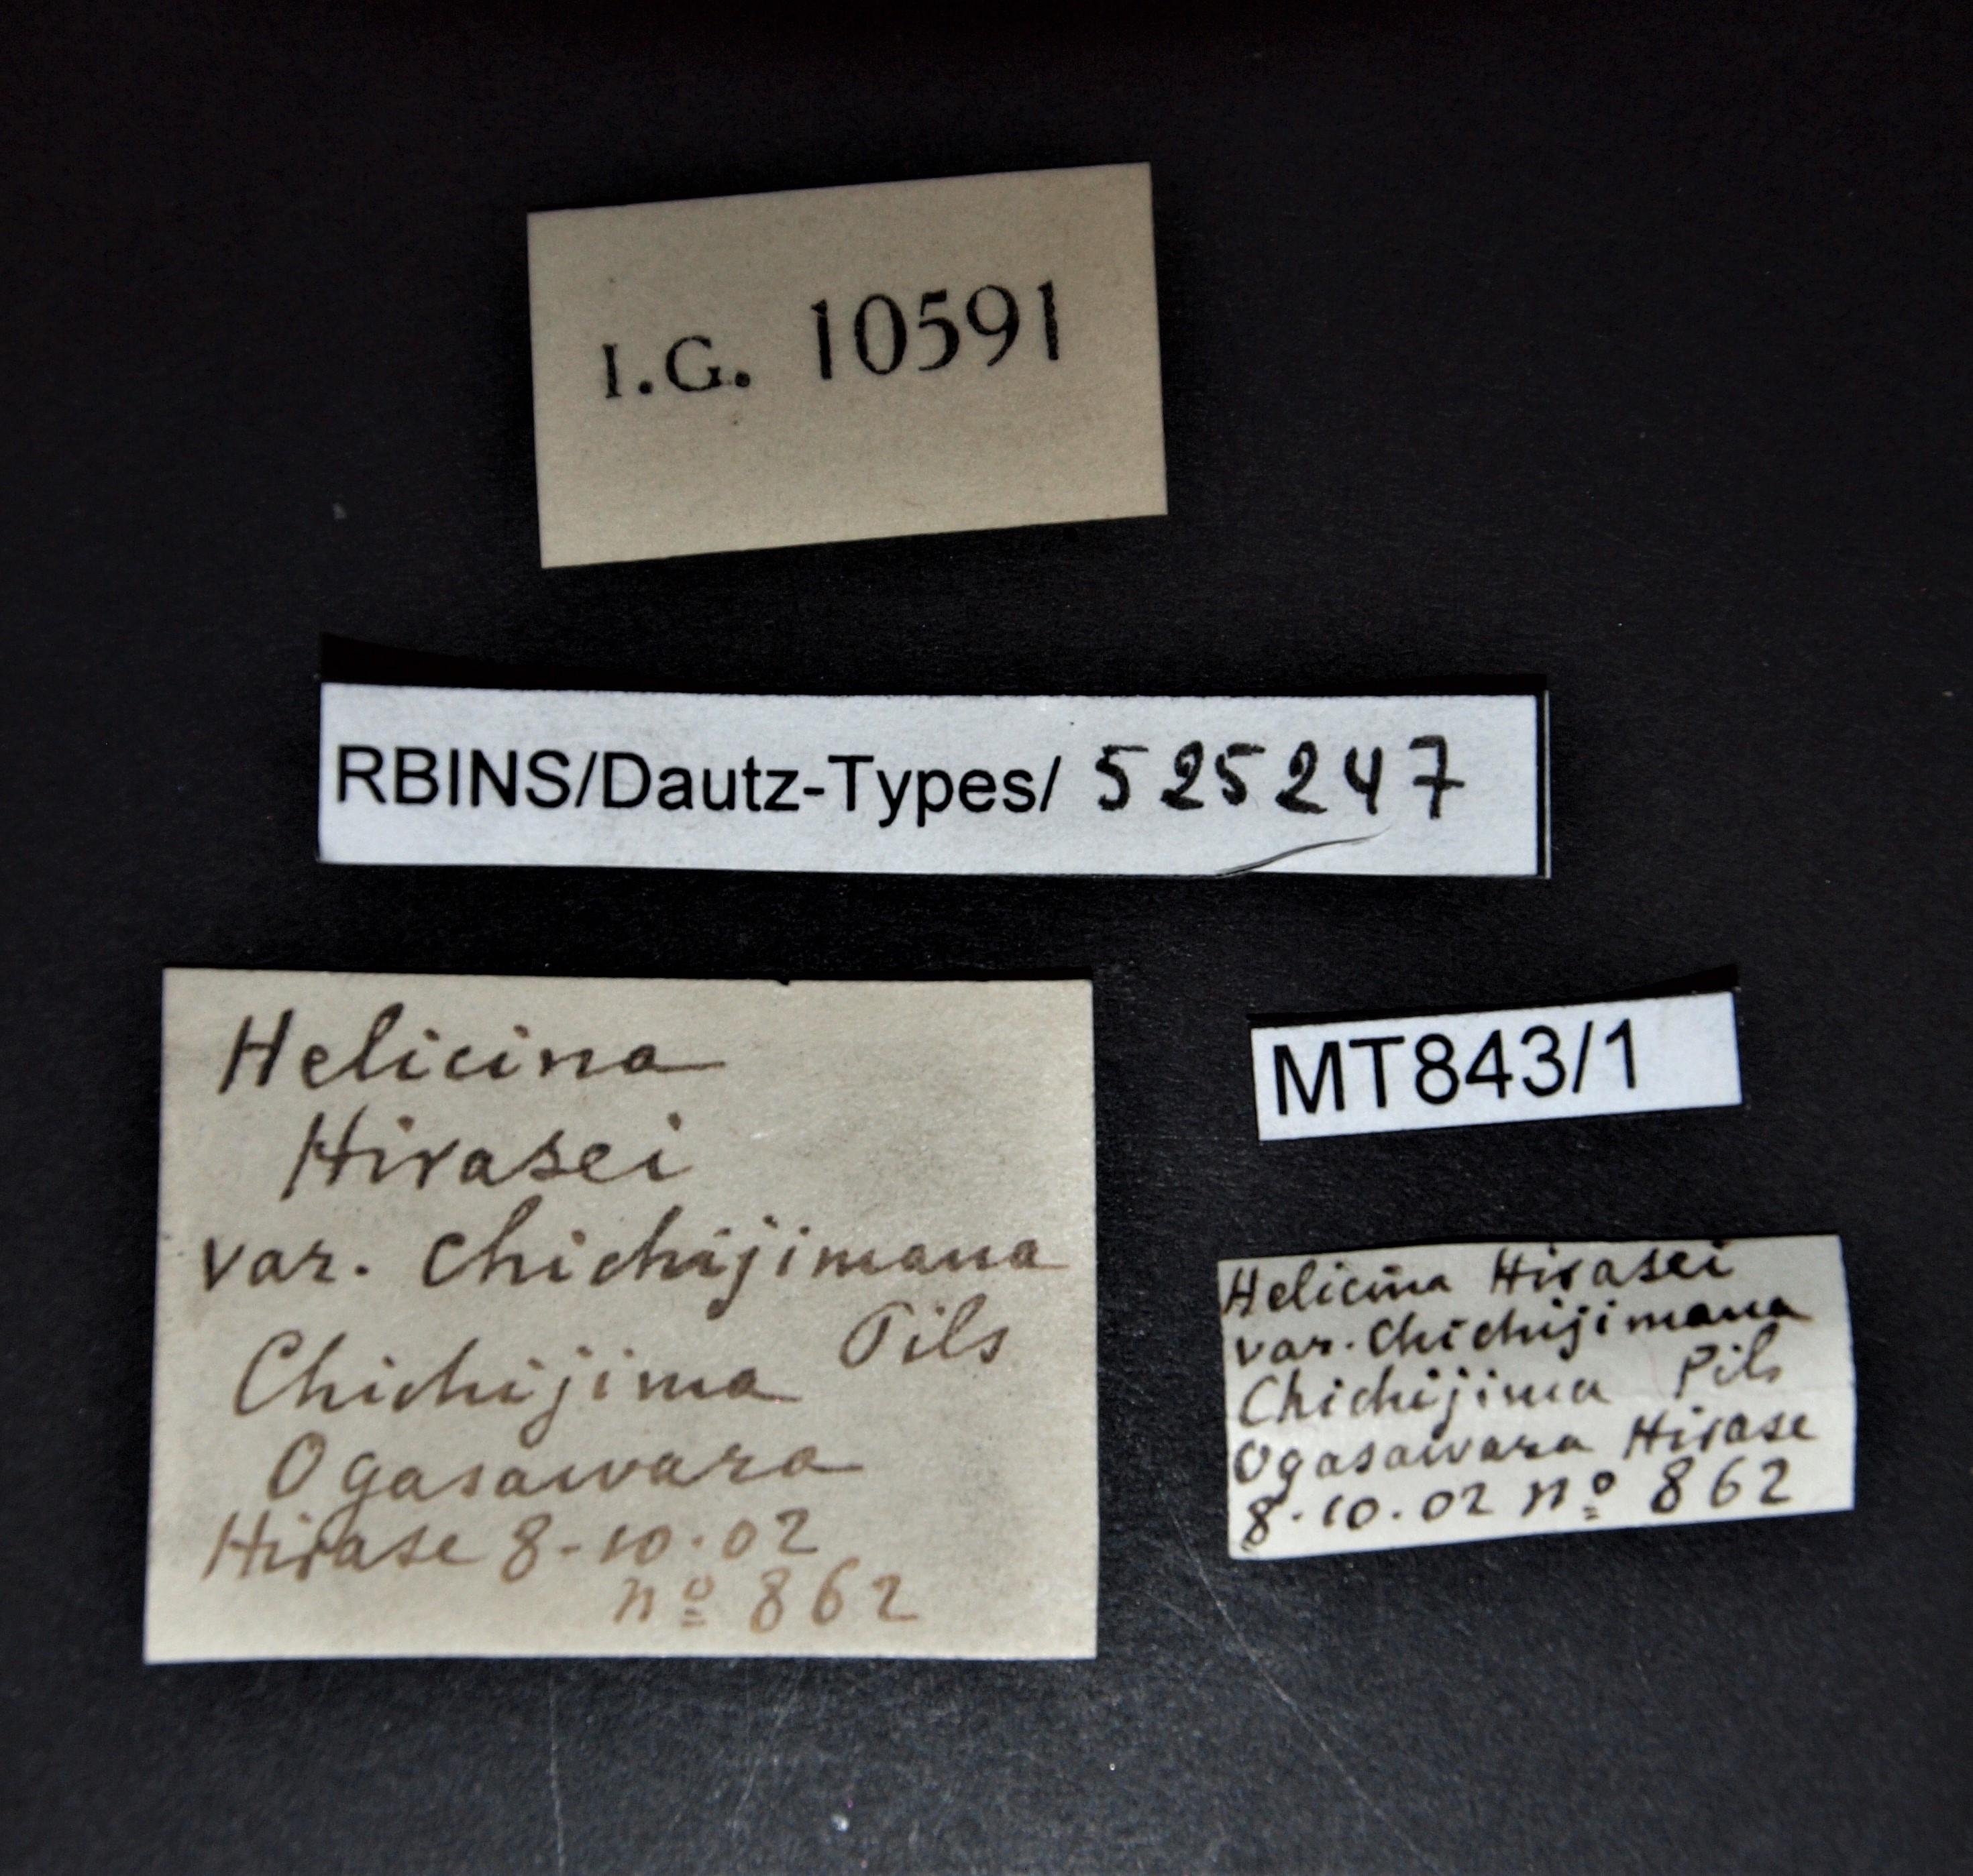 BE-RBINS-INV MT.843/1 Helicina hirasei var. chichijimana pt Lb.jpg